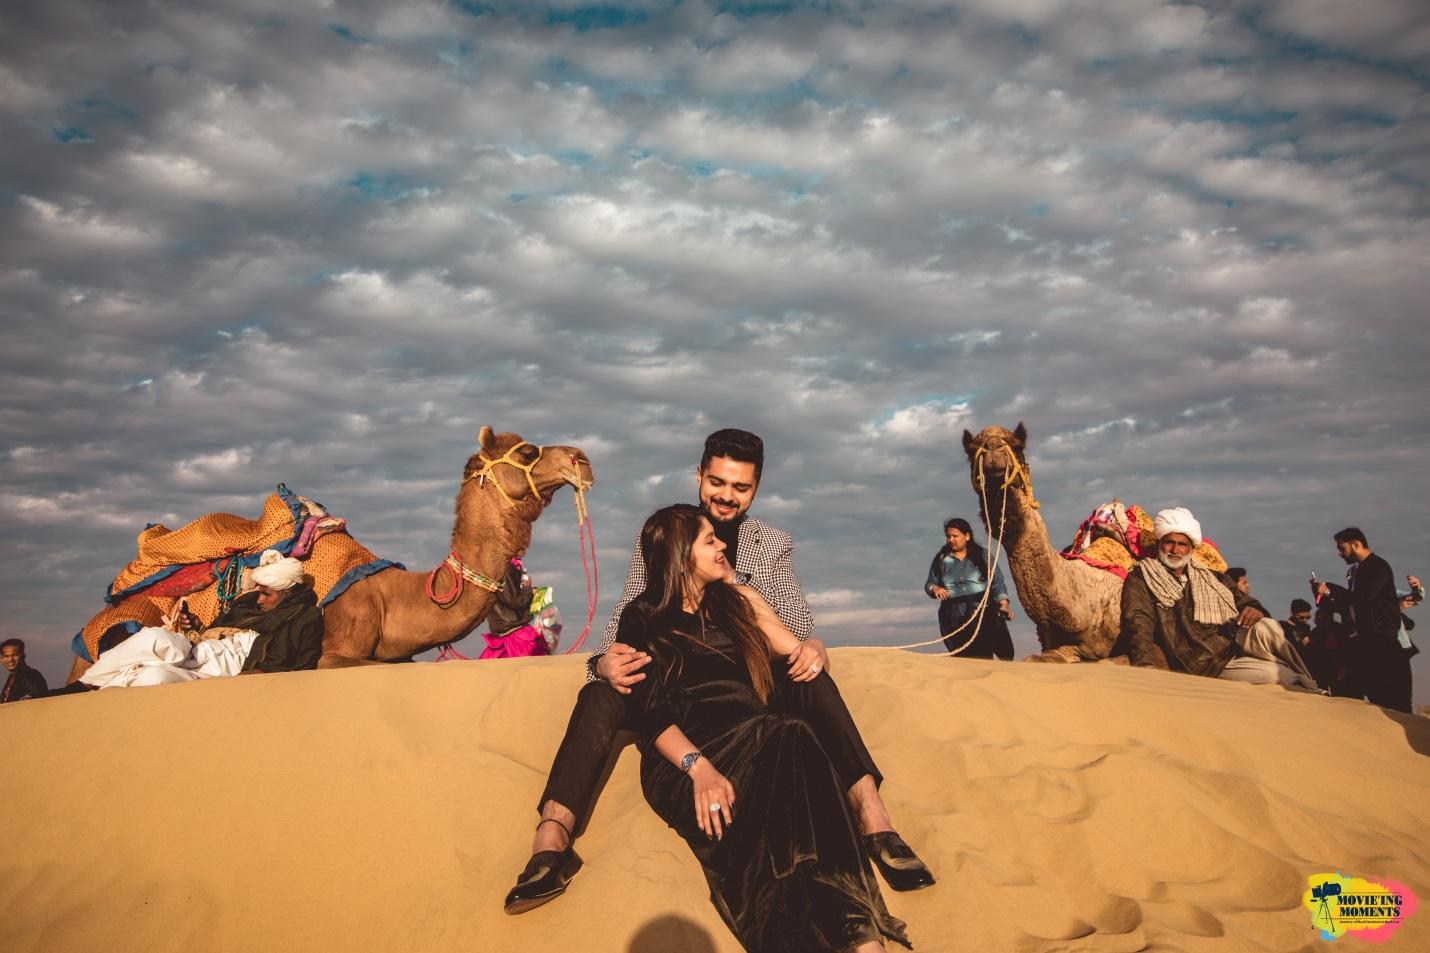 Prewedding shoot in jaisalmer